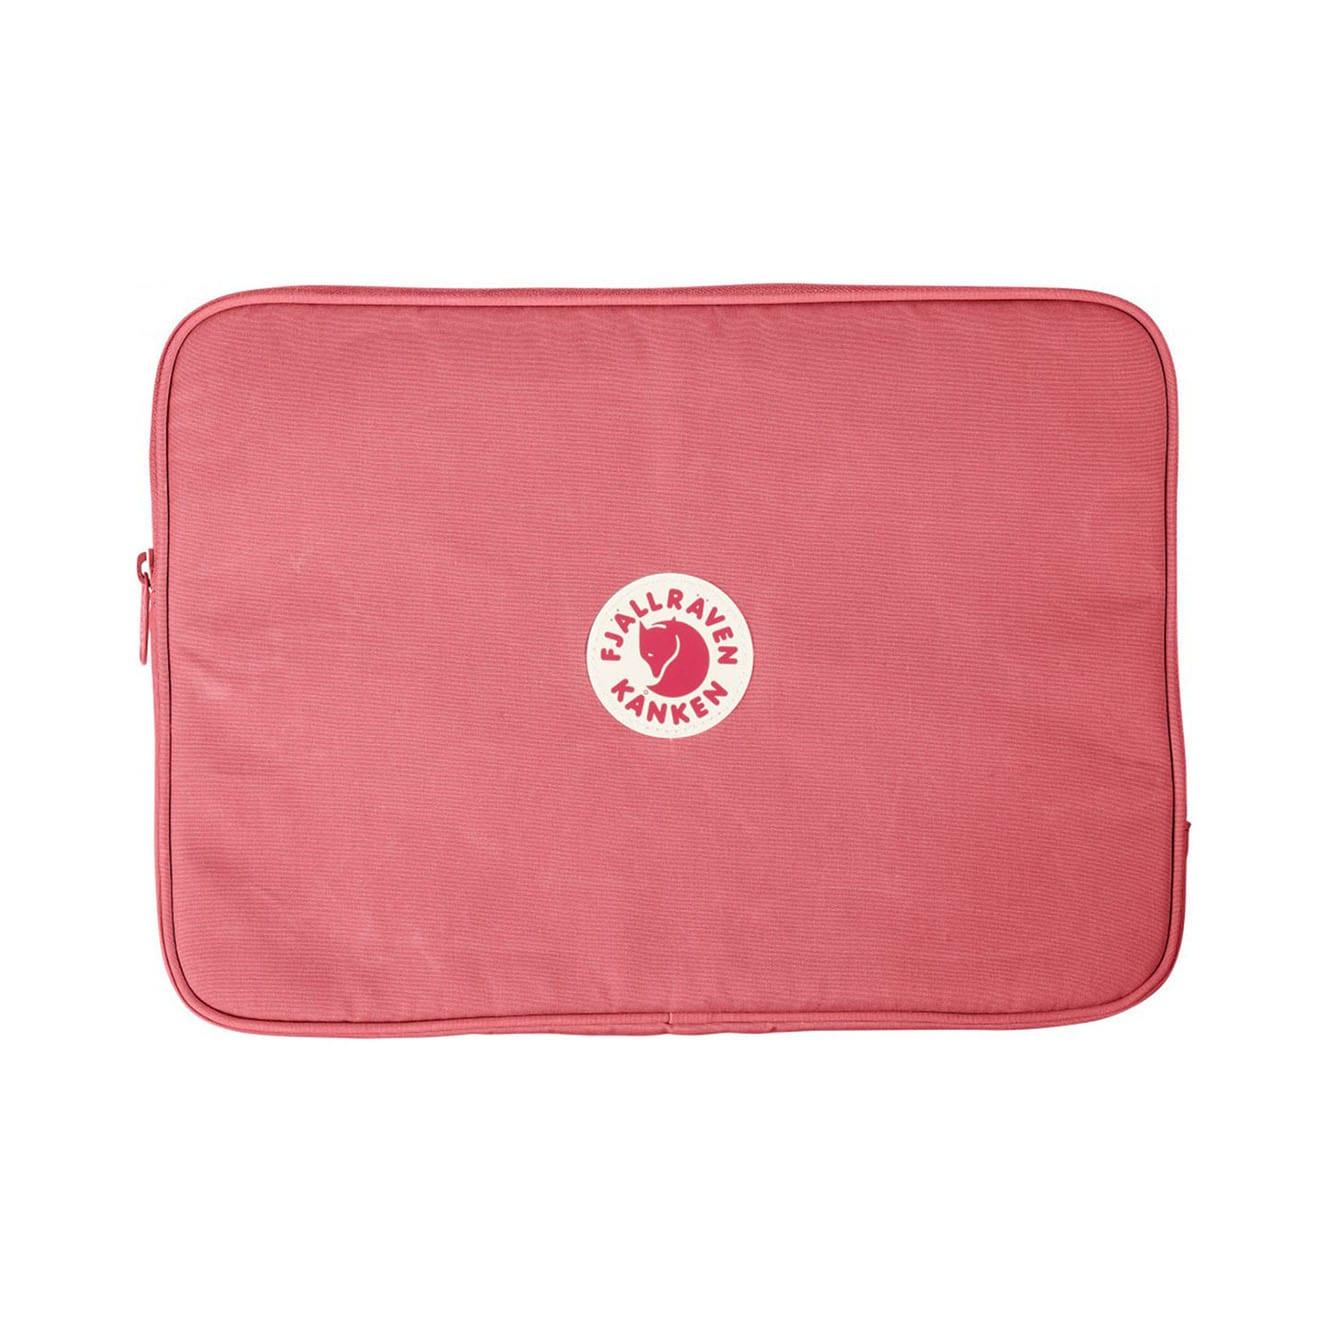 "Fjallraven Kanken 13"" Laptop Case Peach Pink"